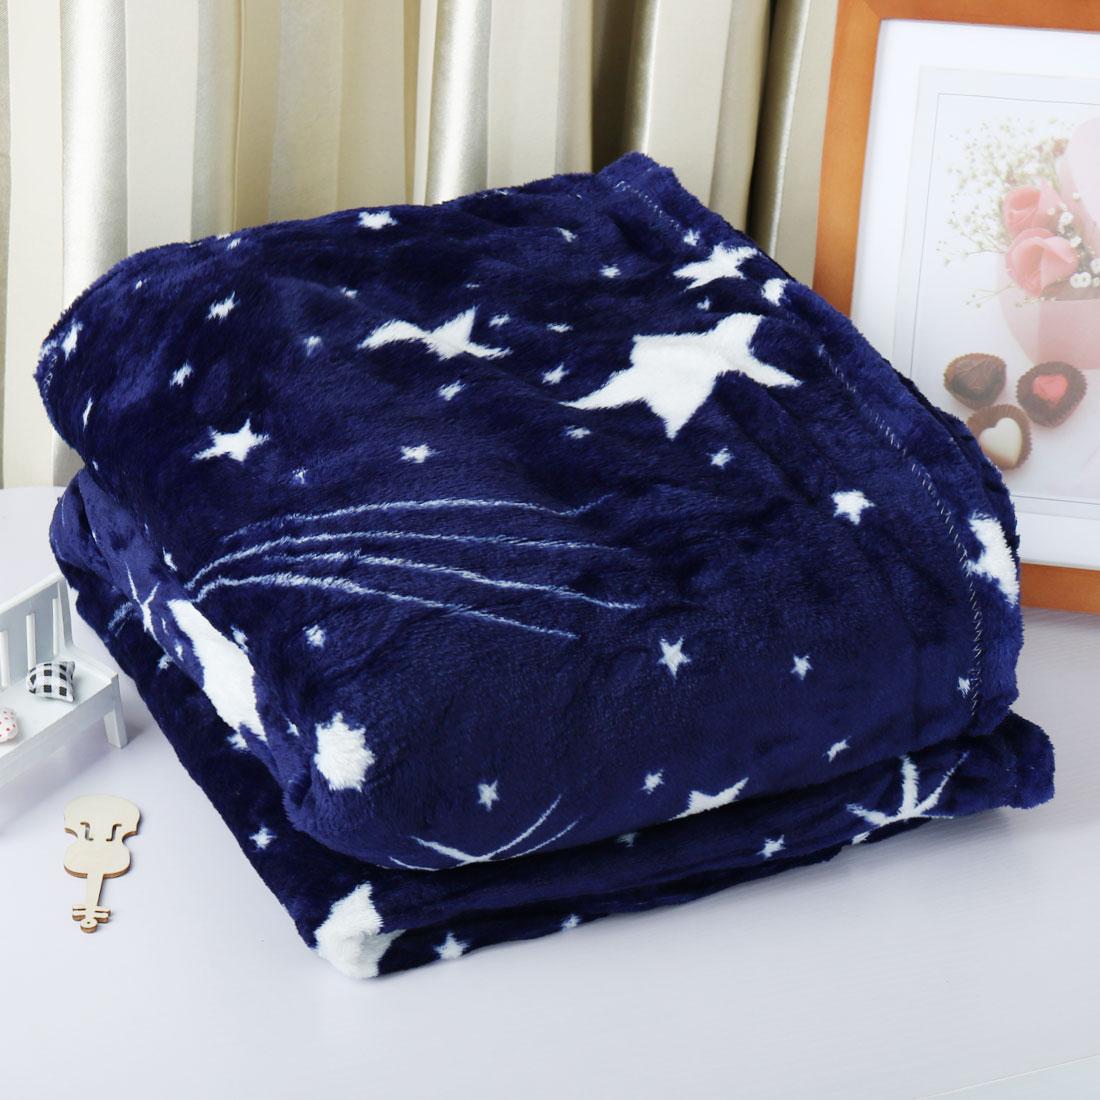 Luxury Warm Soft Large Fleece Sofa Bed Blanket Throw